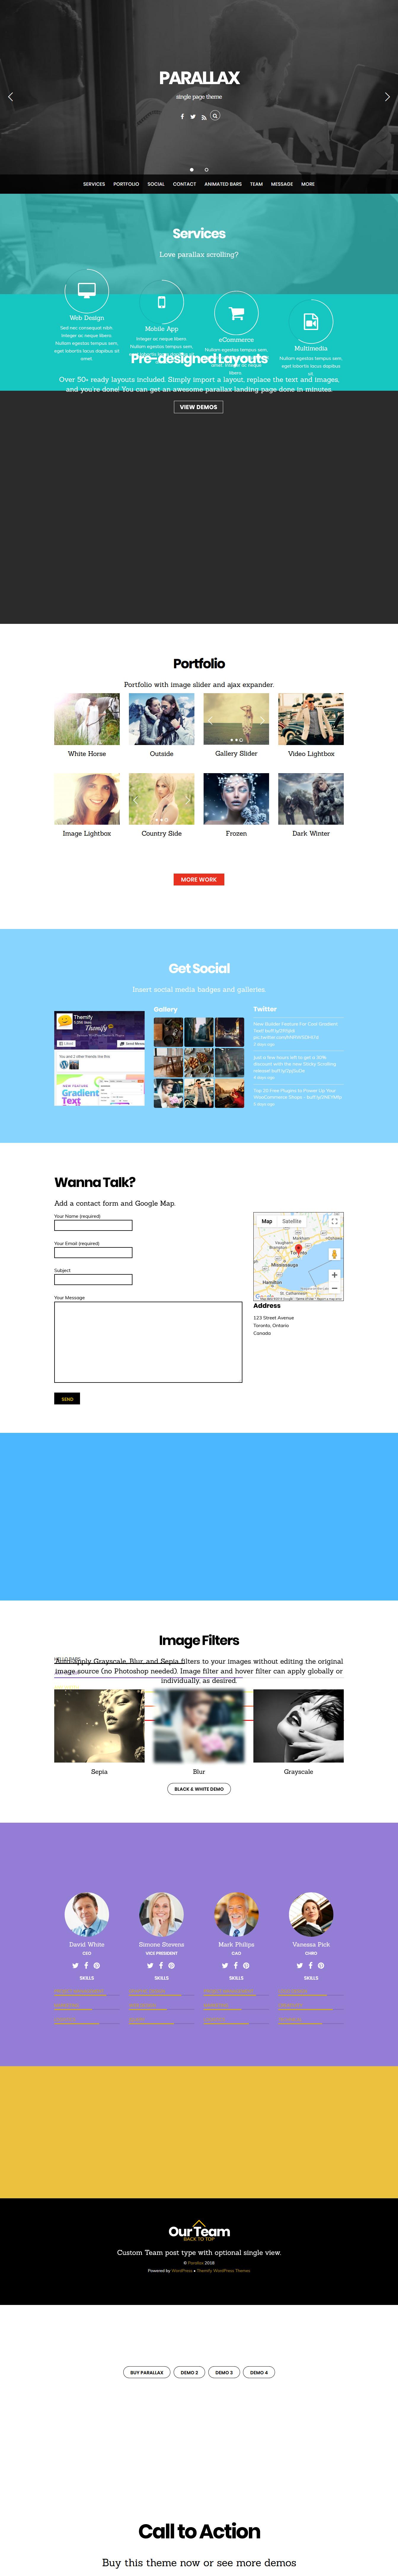 parallax best premium parallax wordpress theme - 10+ Best Premium Parallax WordPress Themes and Templates